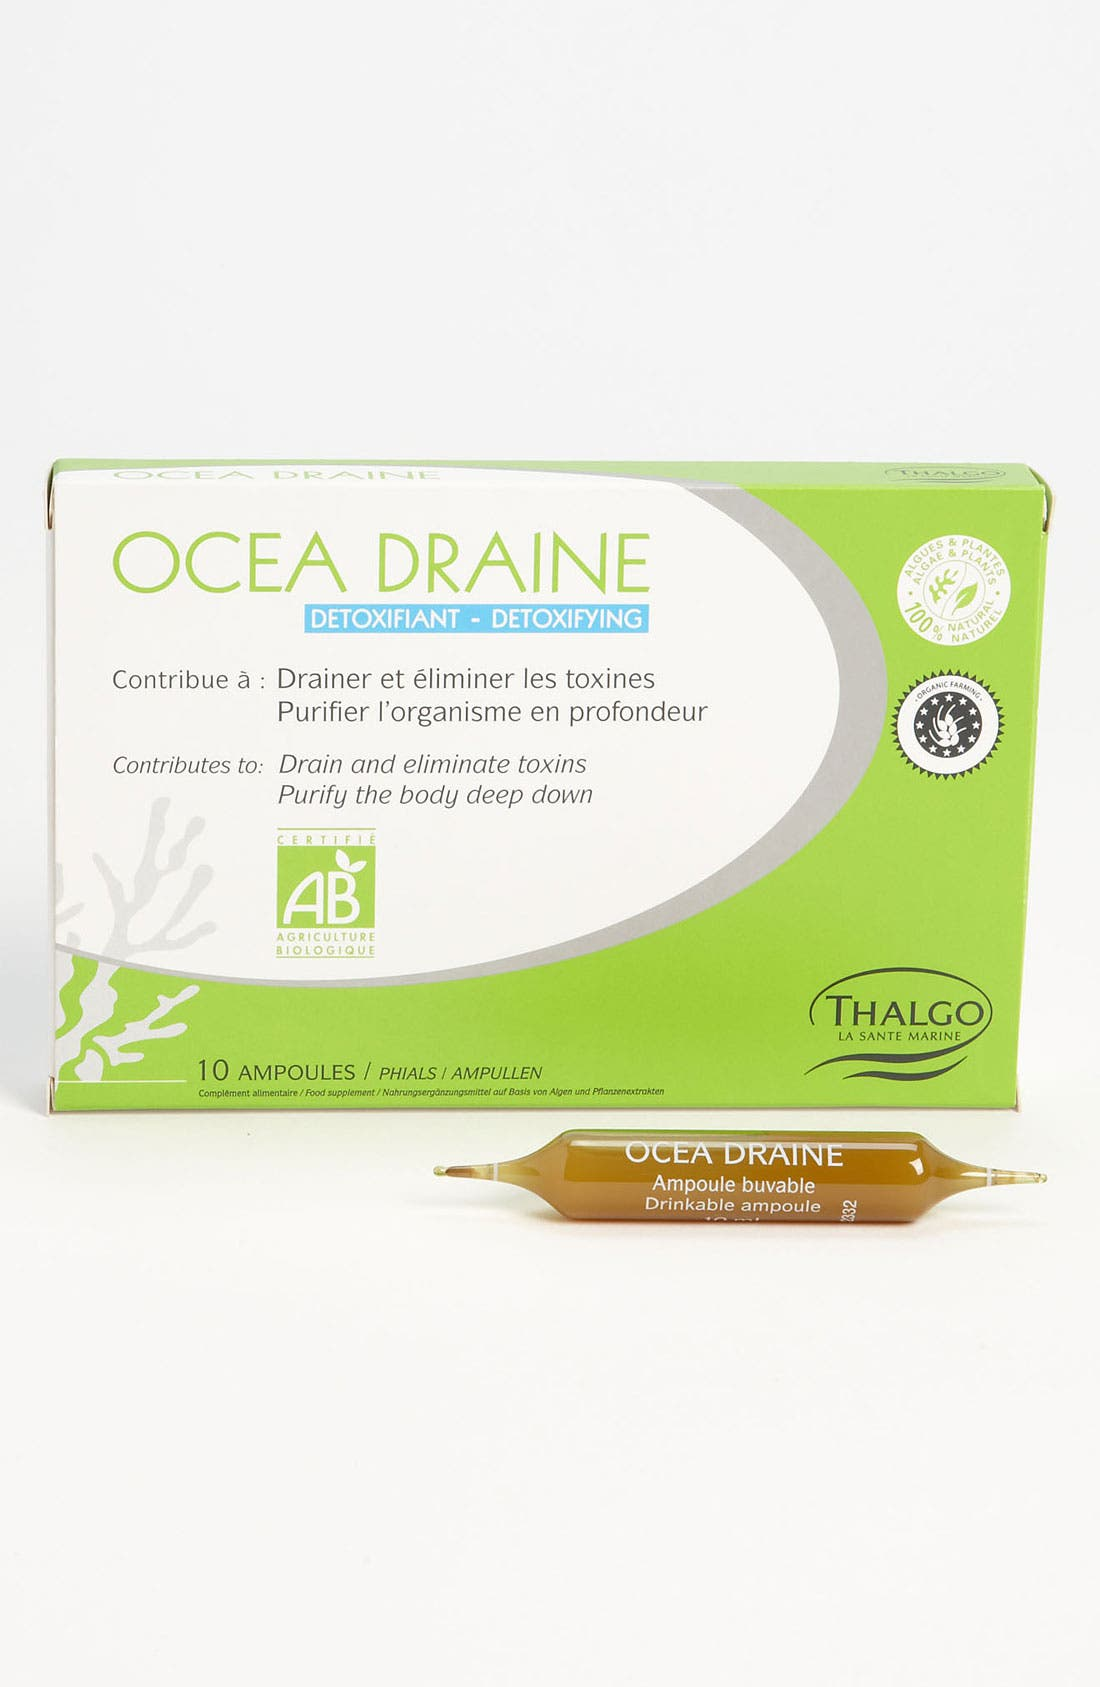 Alternate Image 1 Selected - Thalgo 'Ocea Draine' Drink